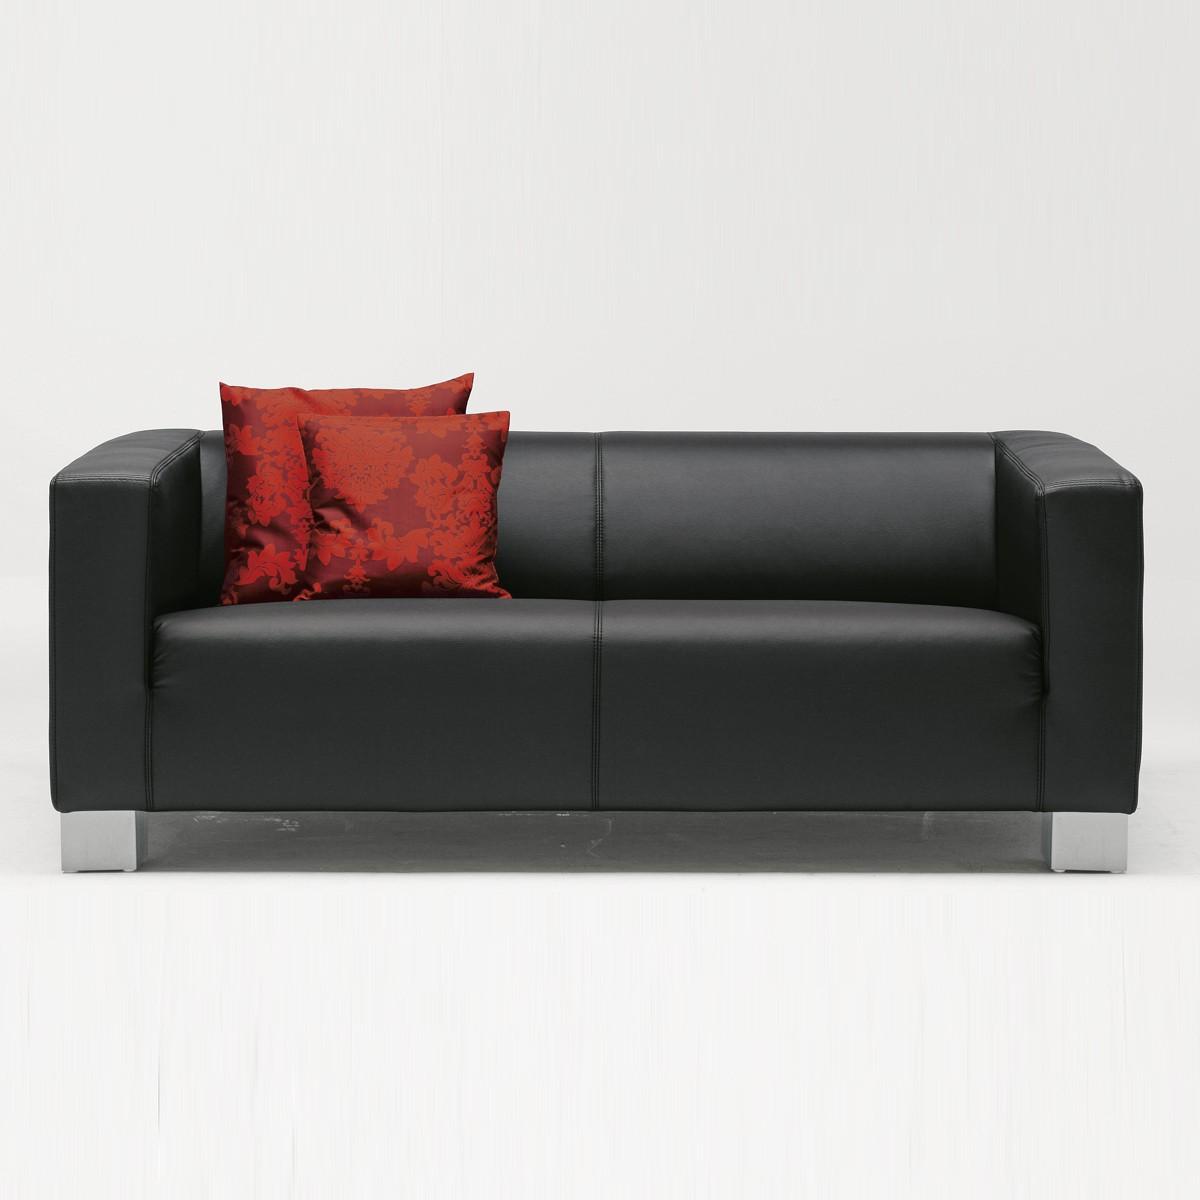 sofa 3 sitzer home design inspiration und interieur ideen ideen. Black Bedroom Furniture Sets. Home Design Ideas